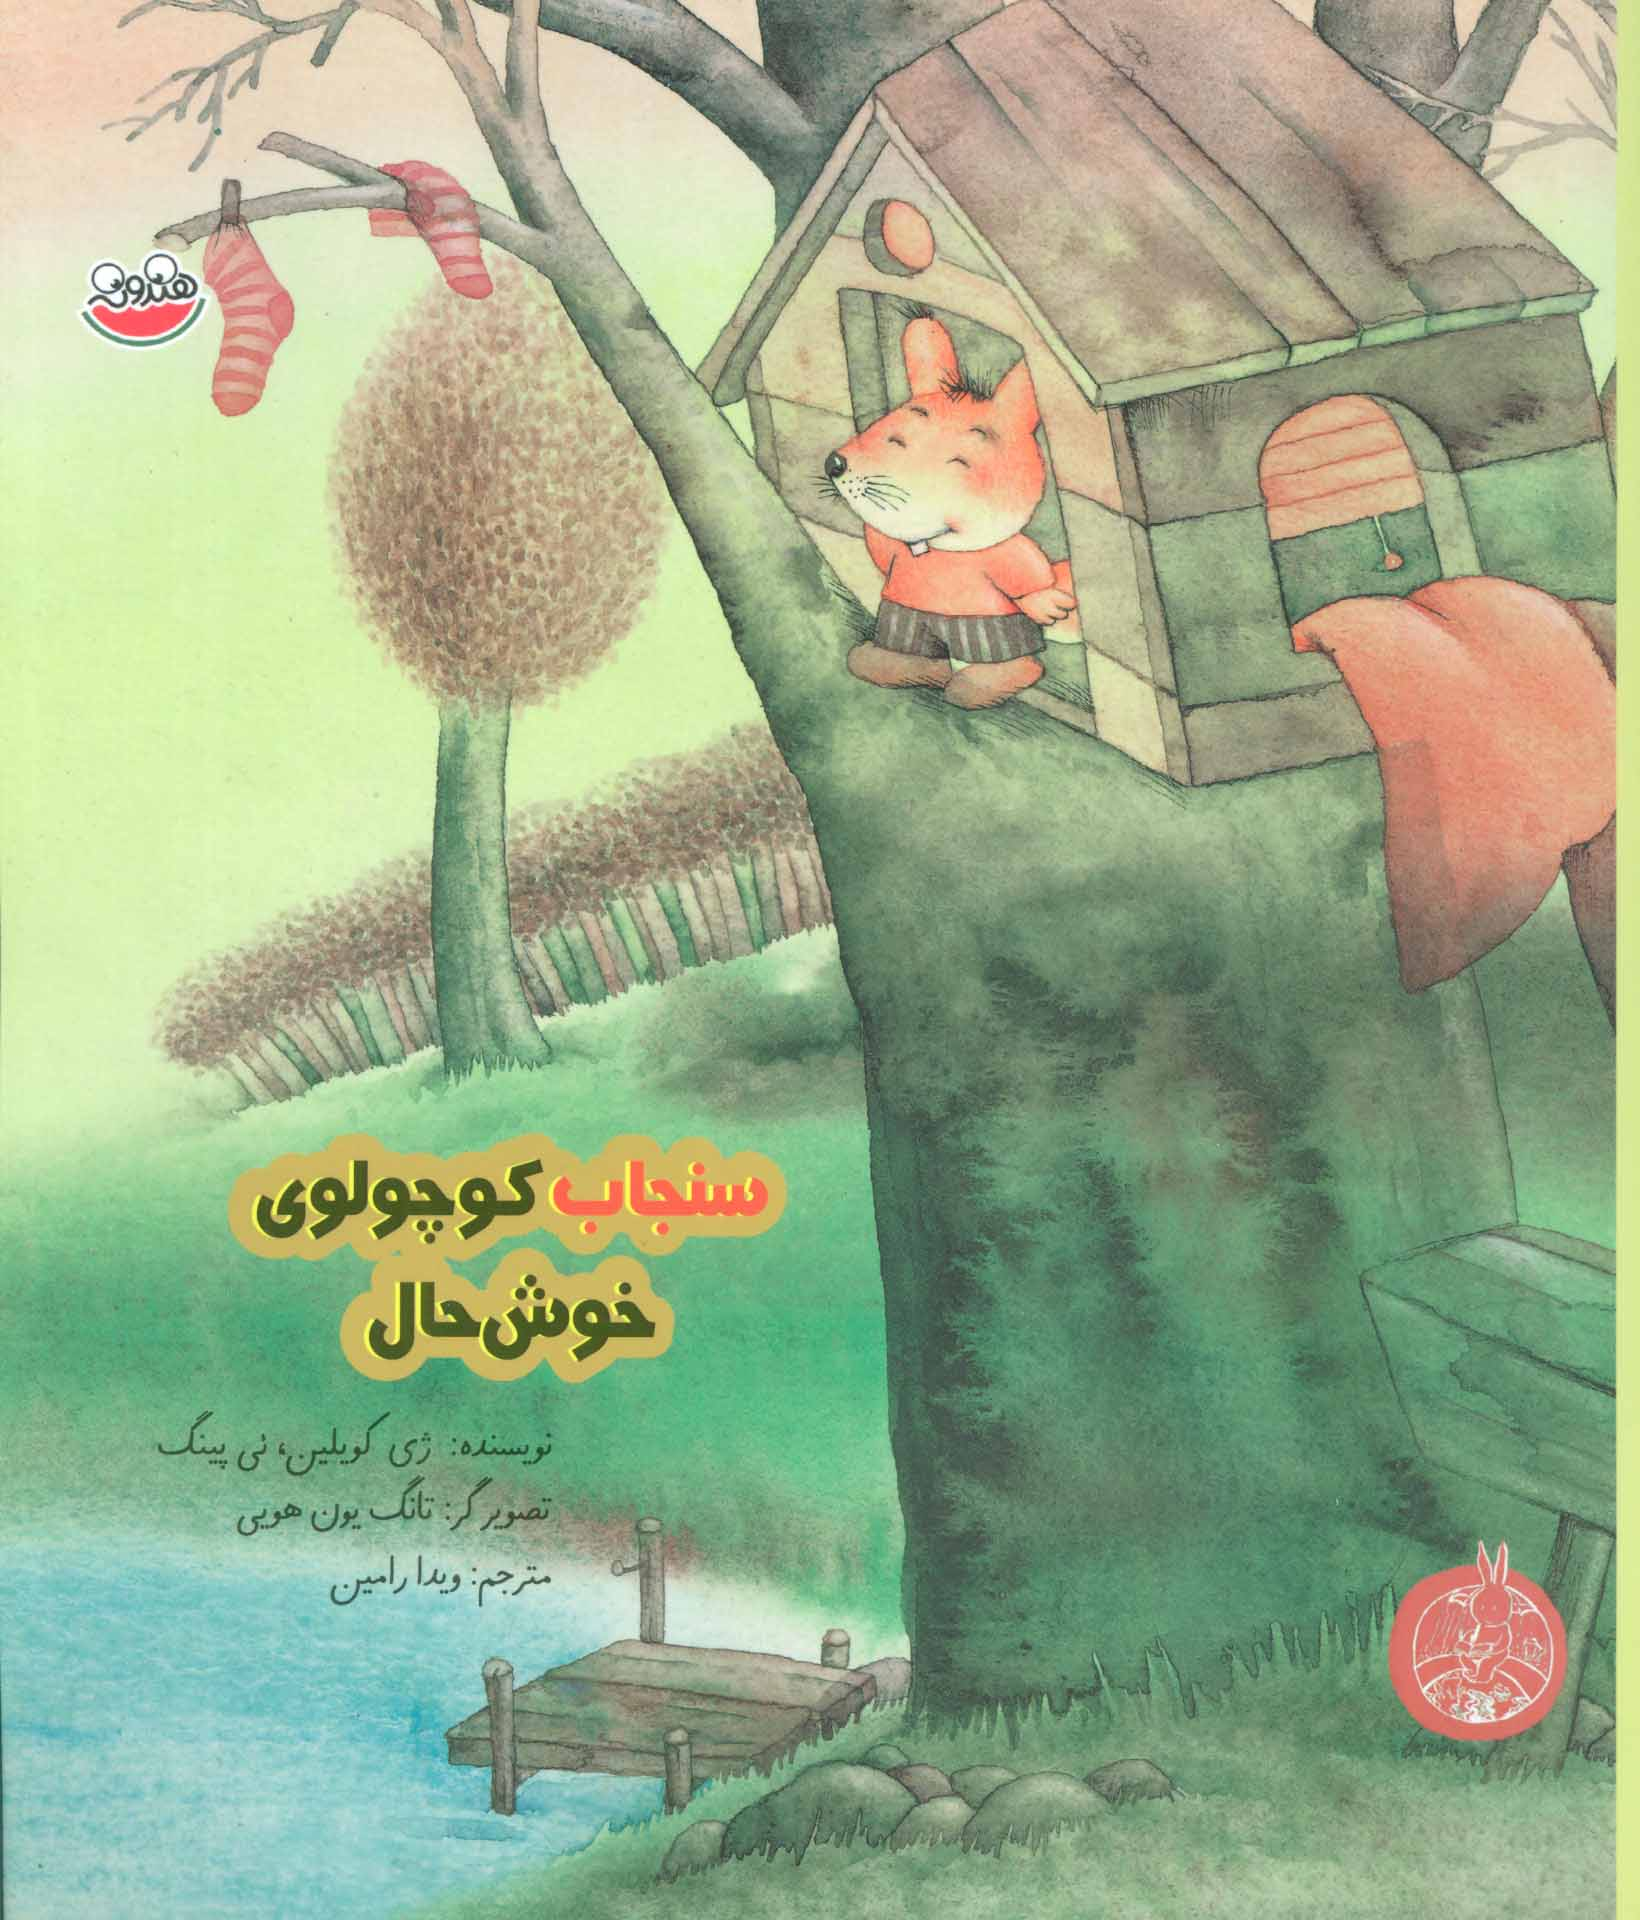 کتاب سنجاب کوچولوی خوشحال